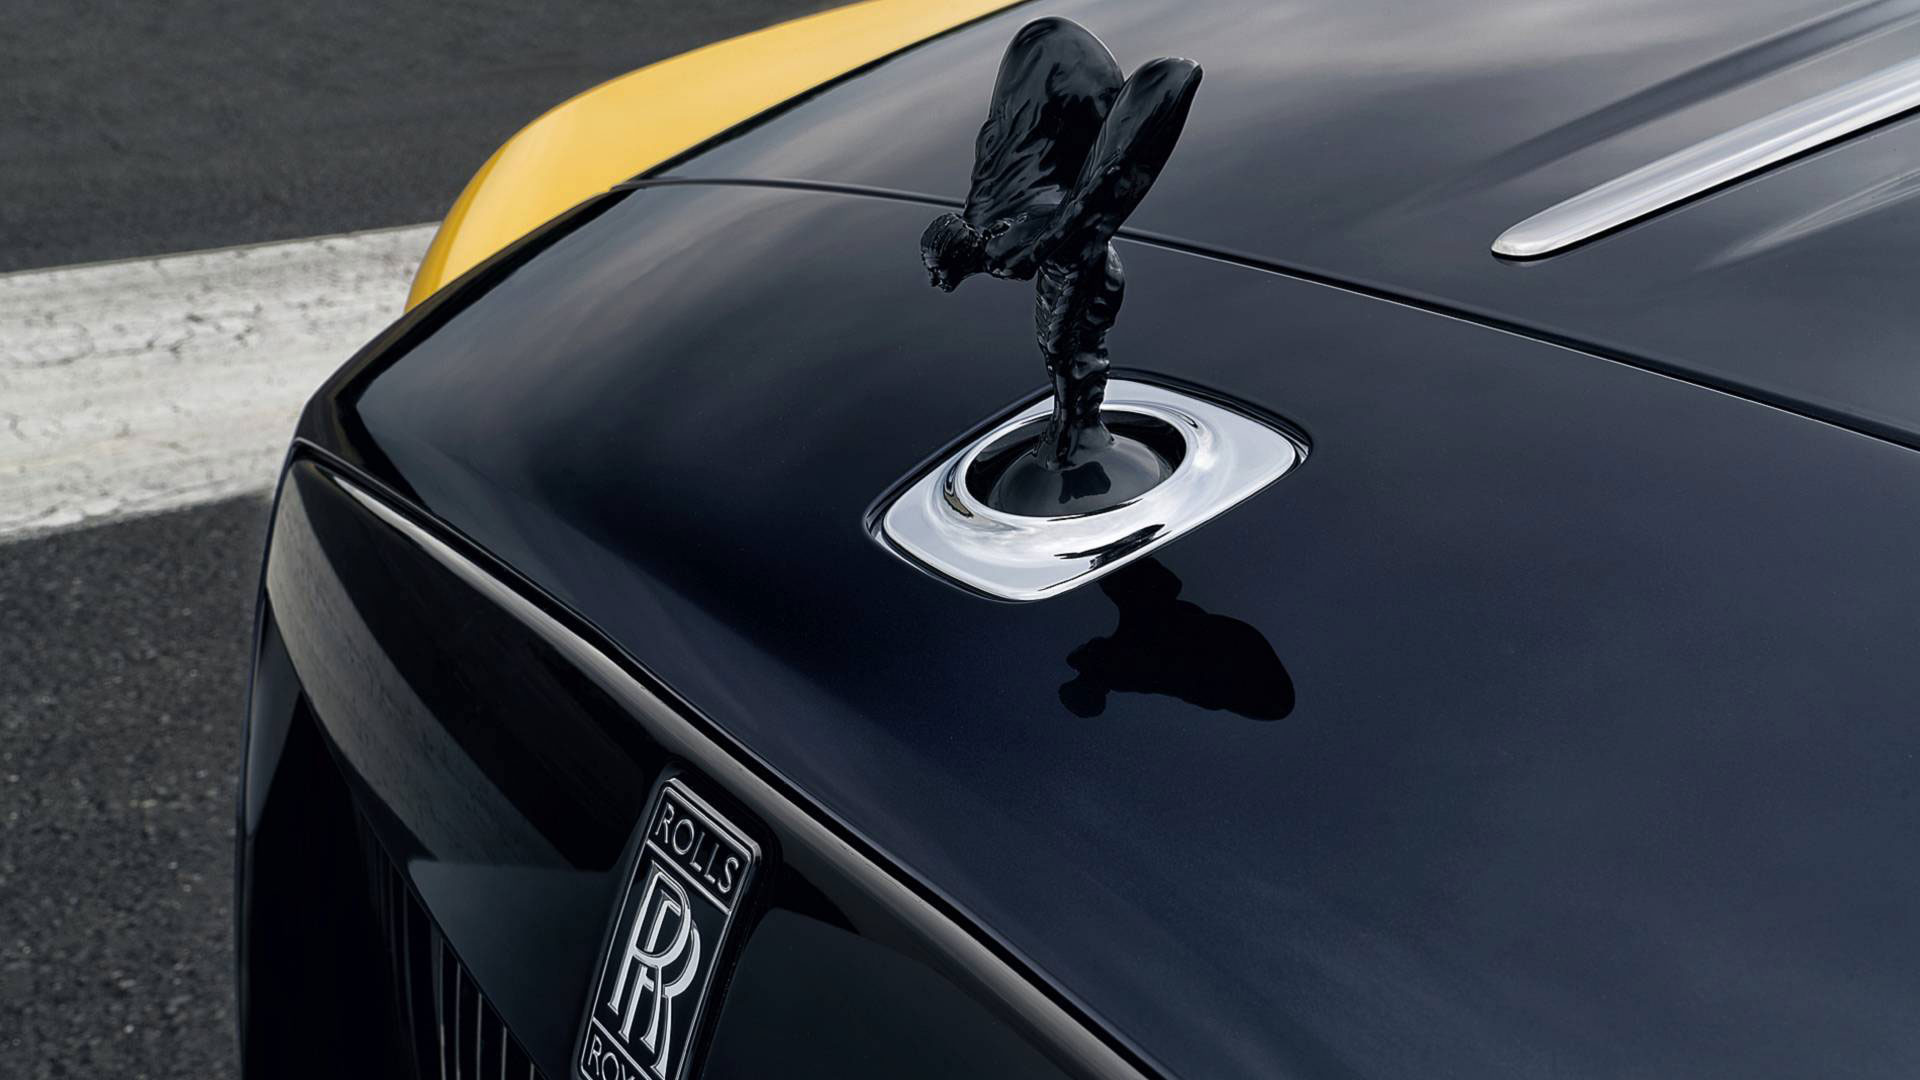 rolls-royce-dawn-black-badge-bespoke